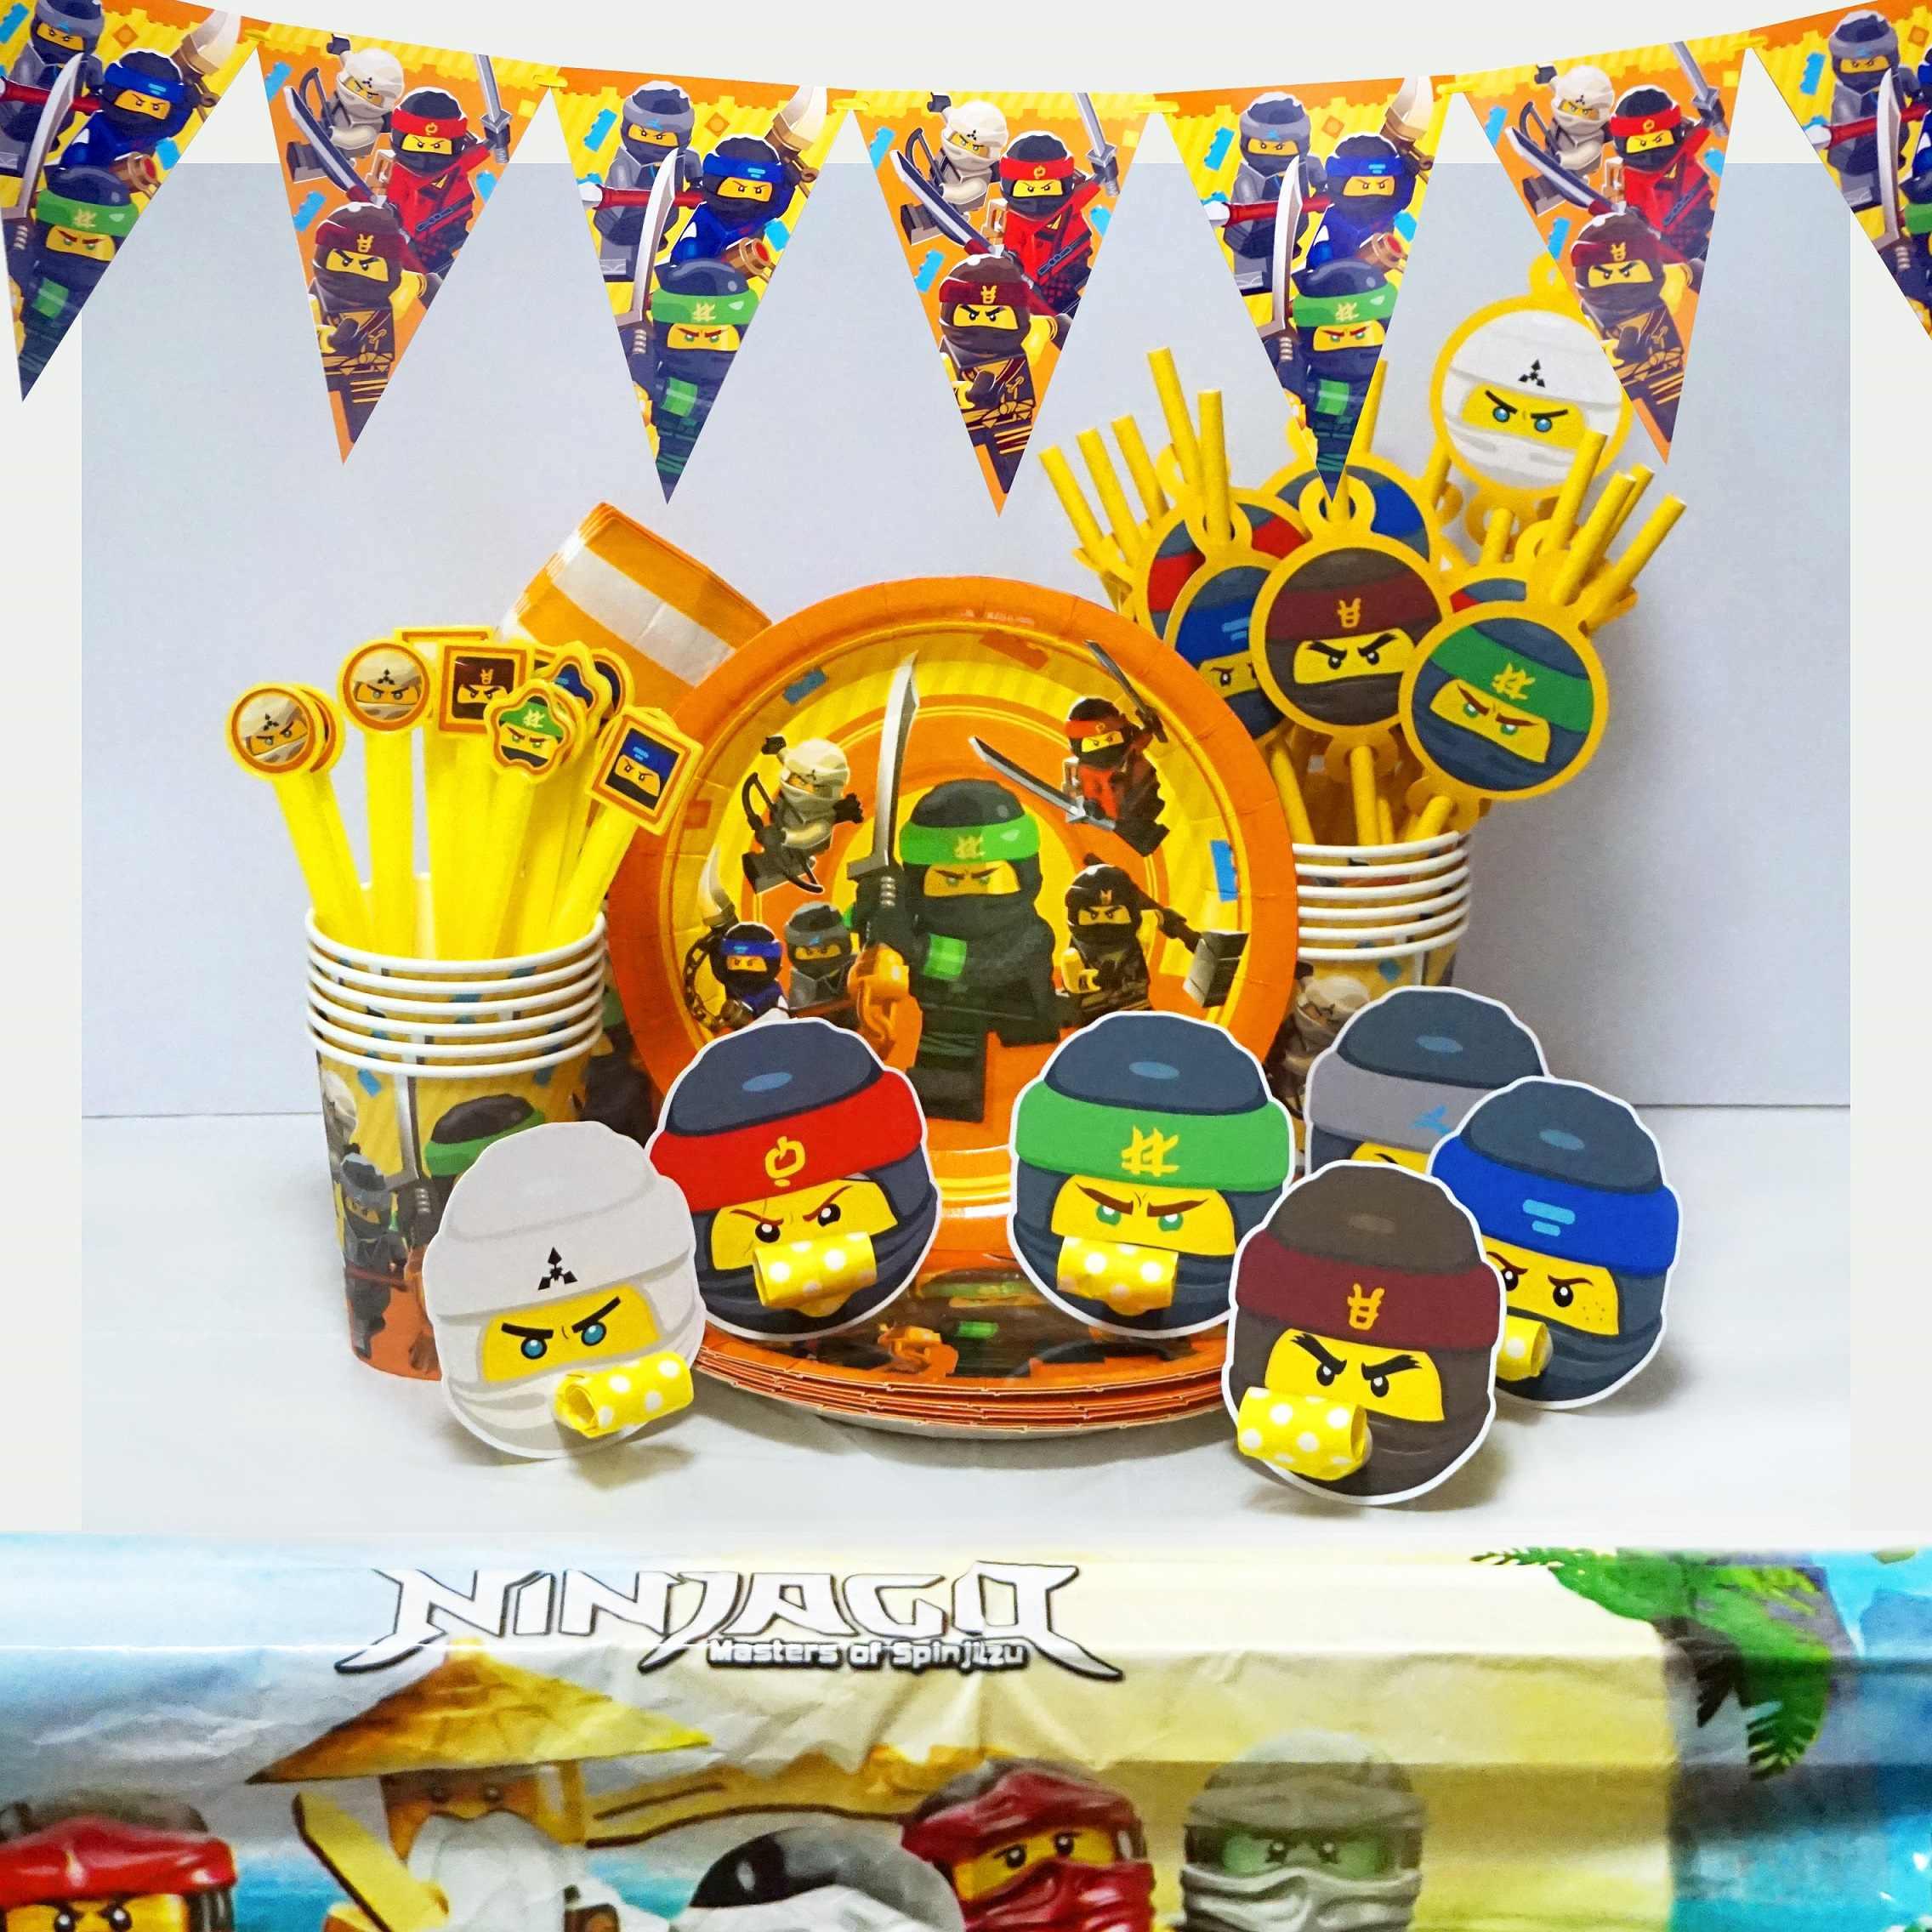 Legoing ninjaguing حفلة عيد ميلاد لوازم الطاولة/المائدة قابل للتصرف ملثمين النينجا ورقة القش سوبر بطل توريد موضوع الحسنات للأطفال